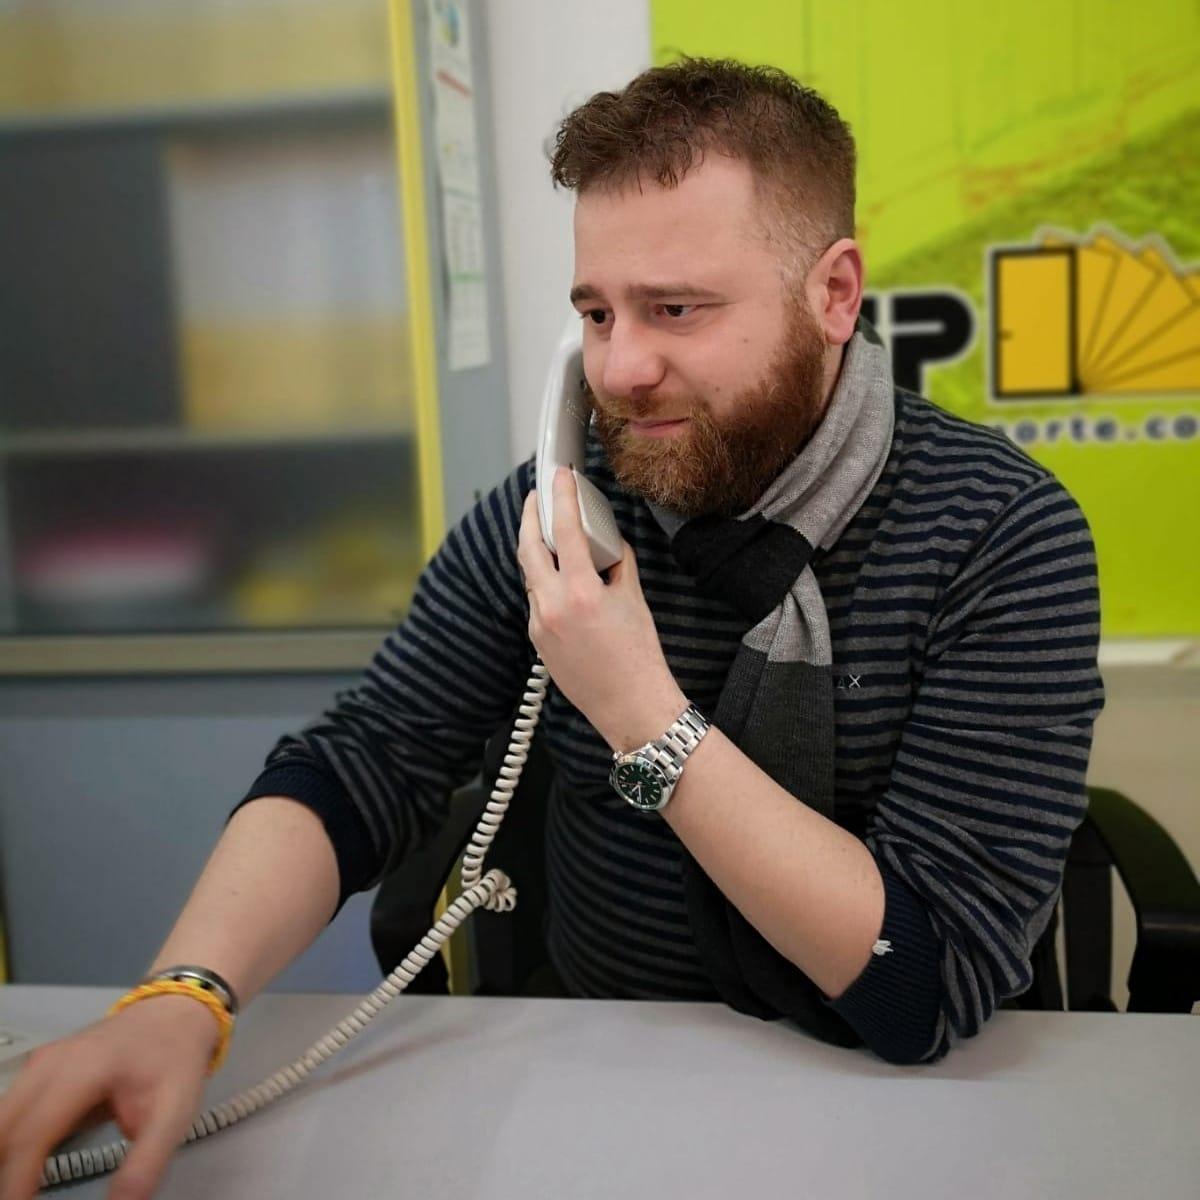 Giuseppe Conforto